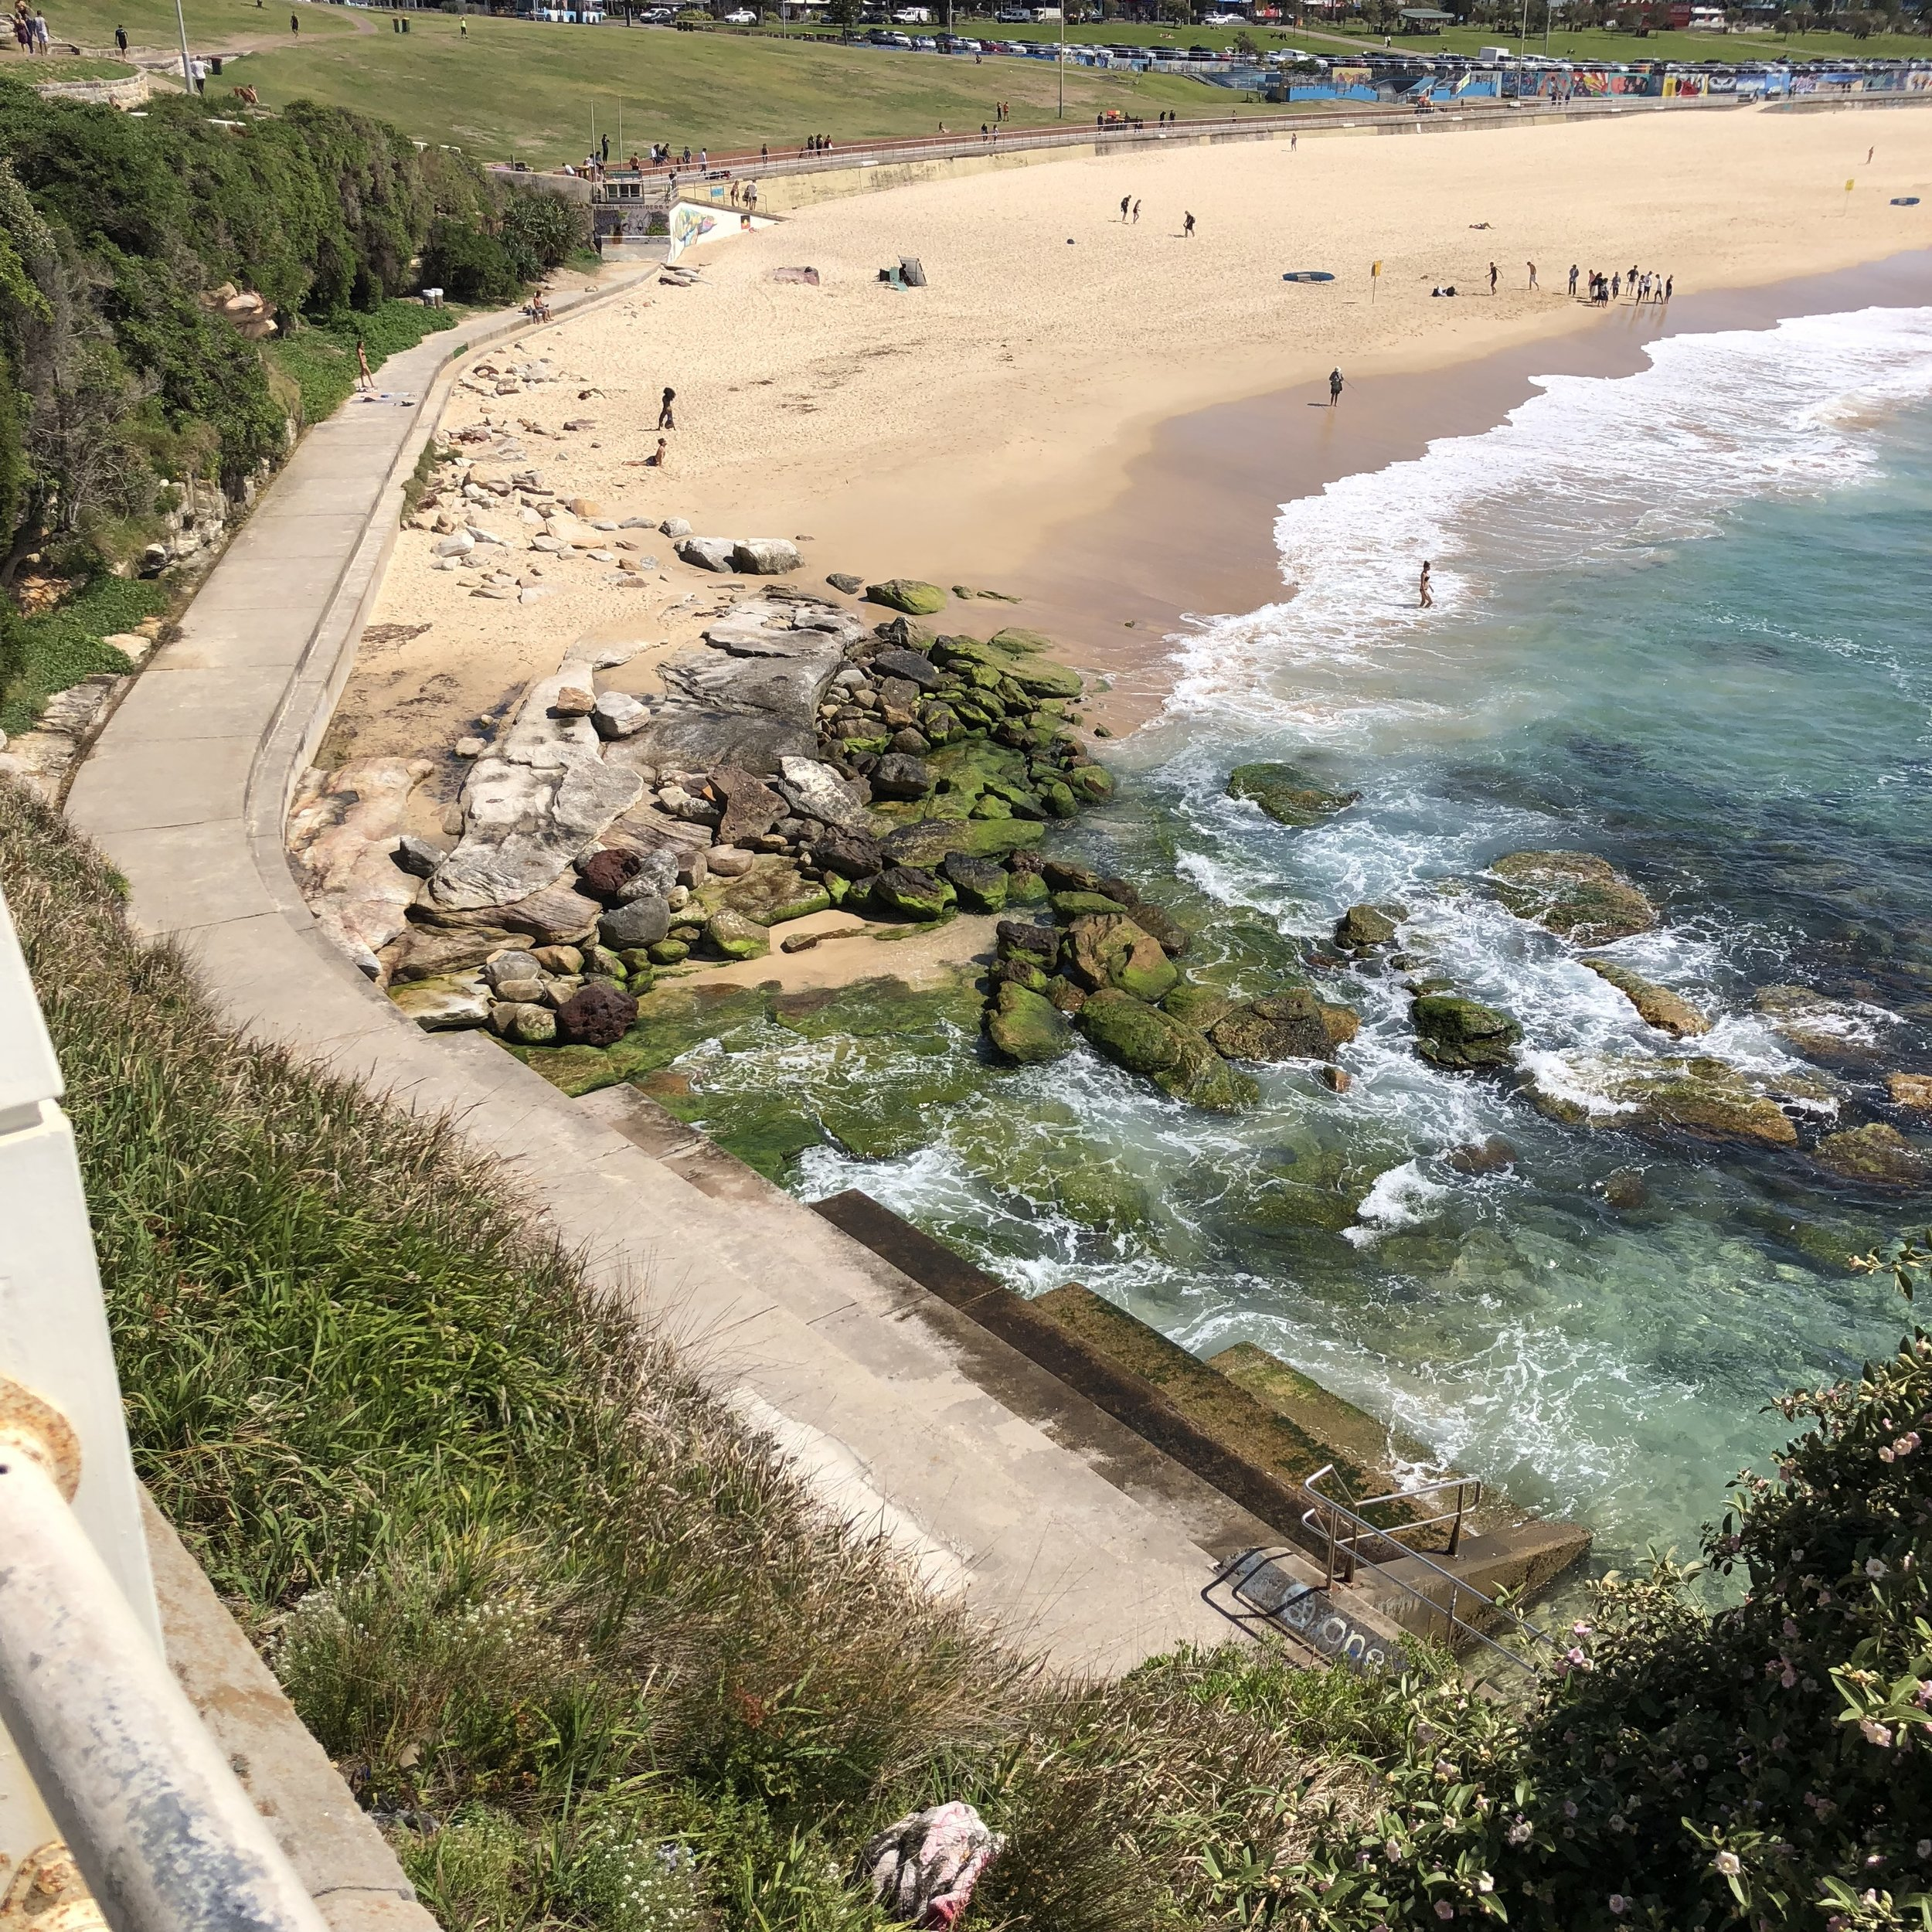 Bondi beach, I saw so many surfers!